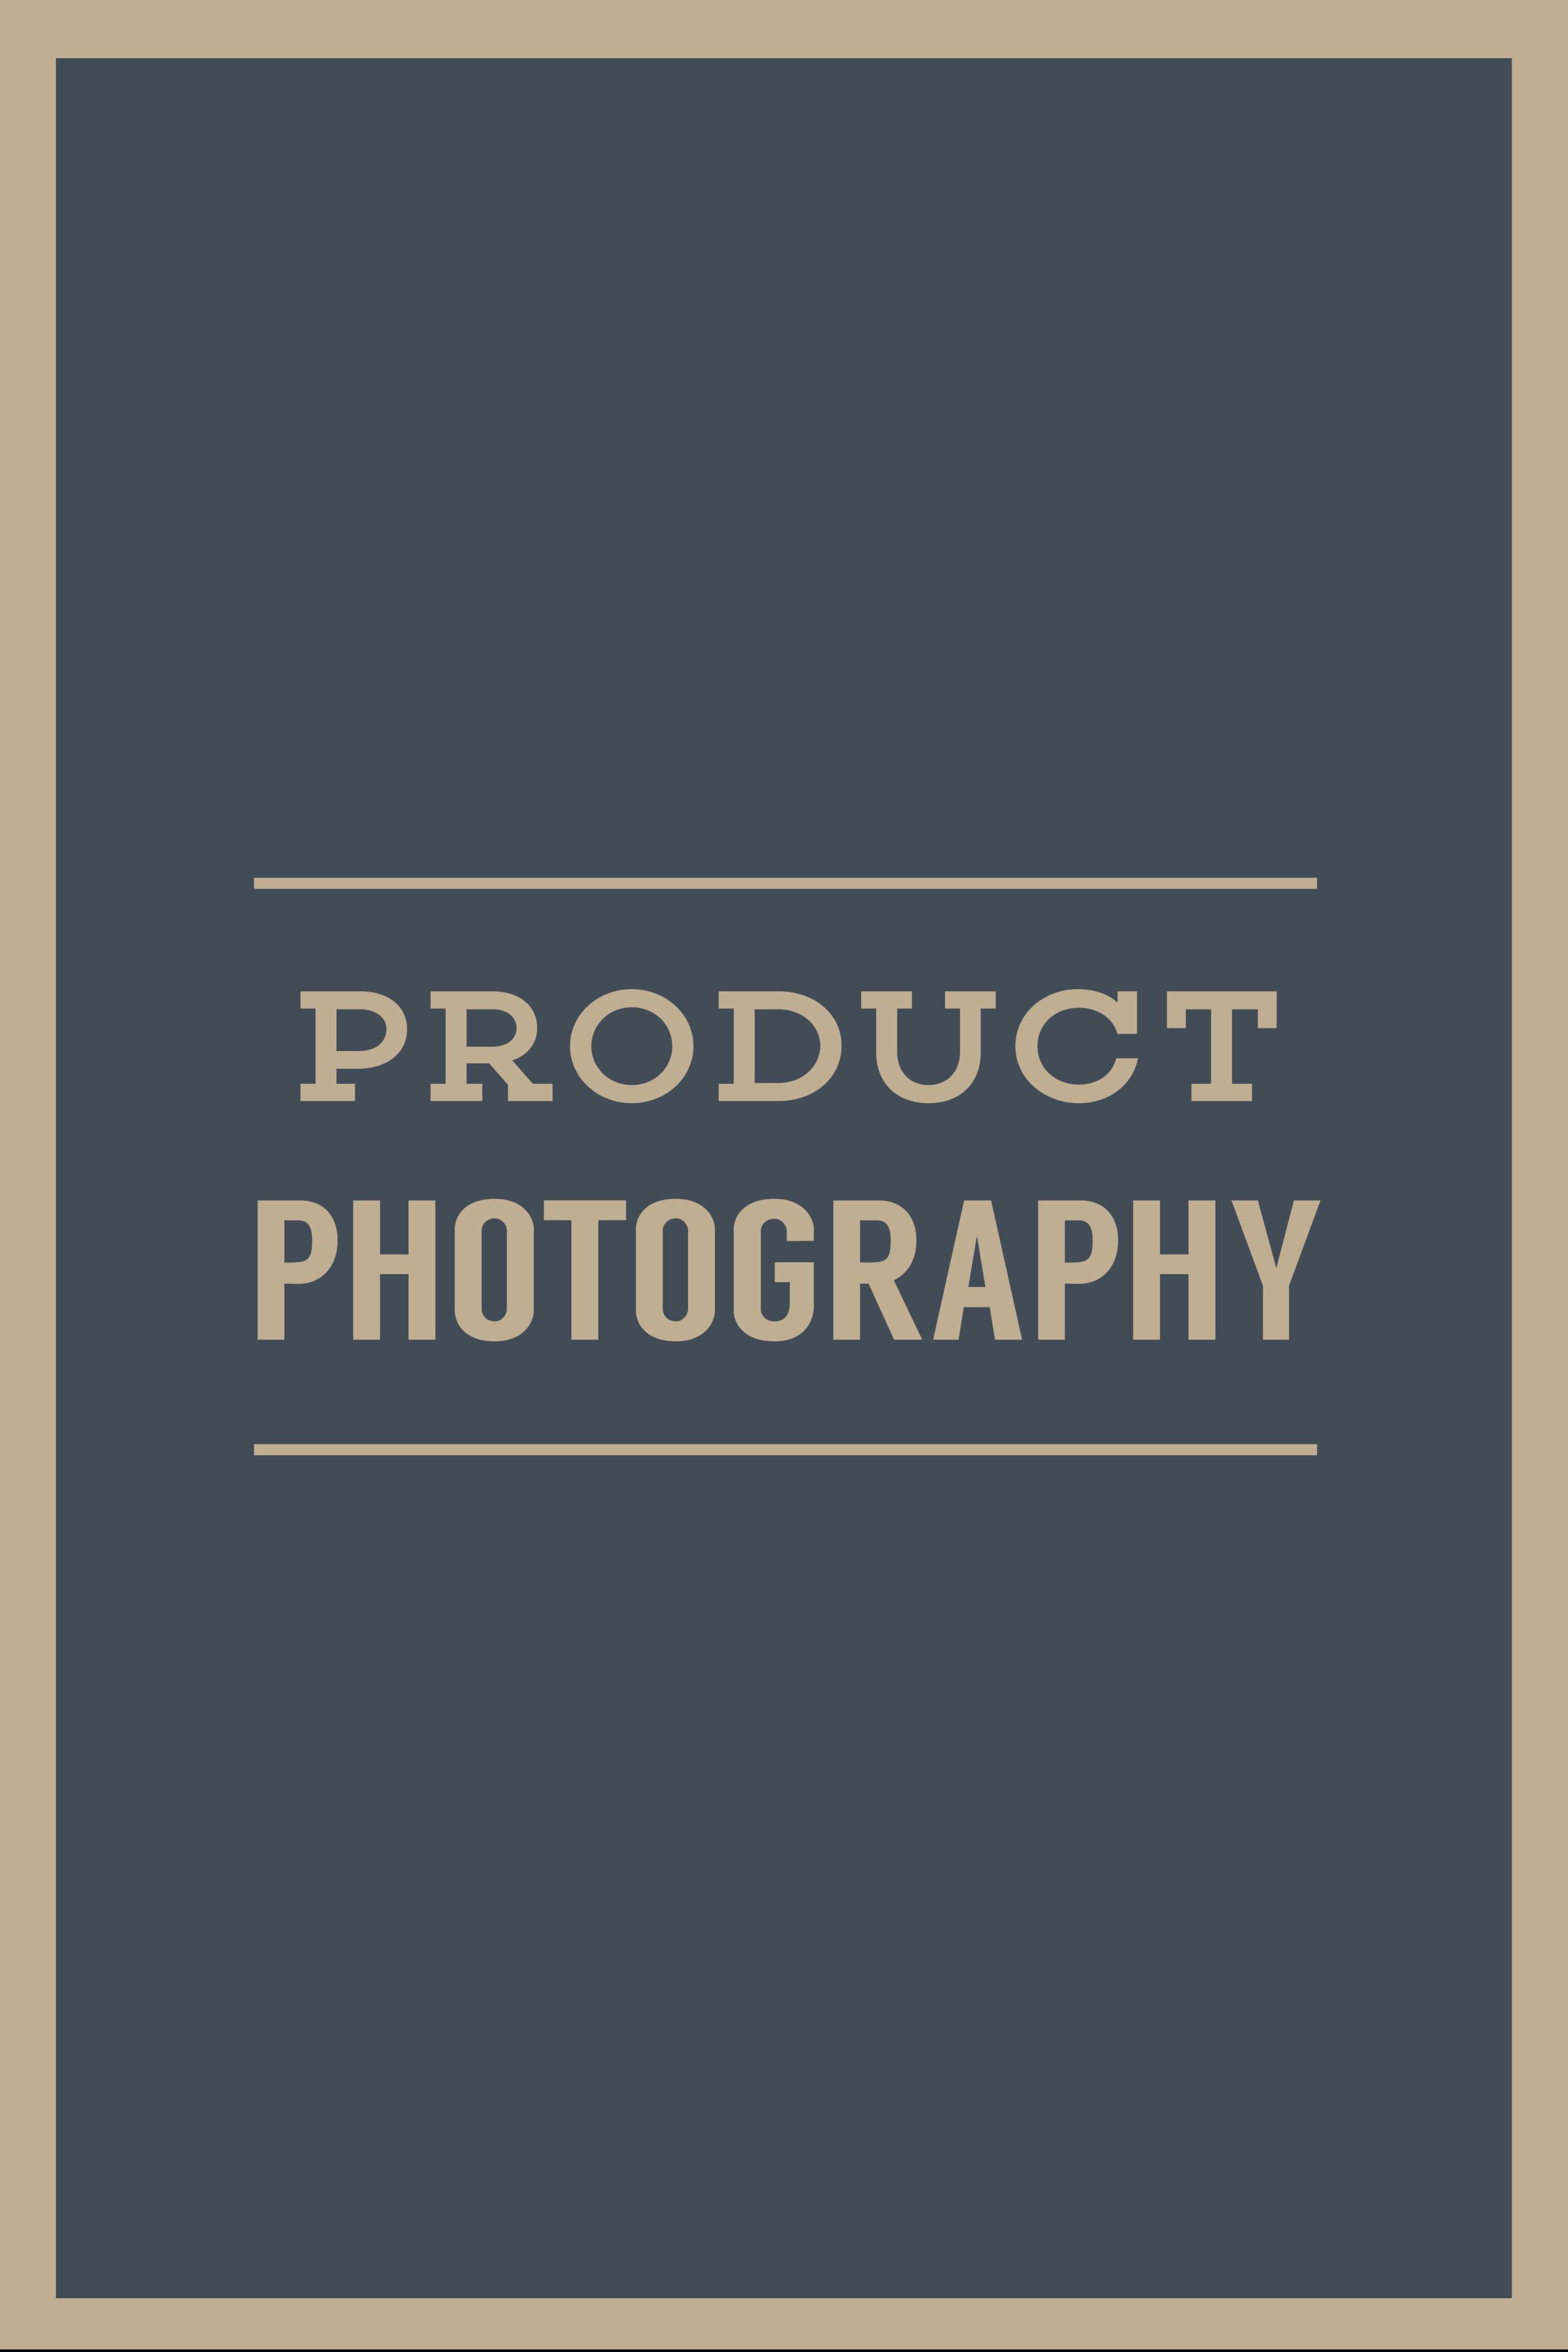 PortfolioCovers-02.png